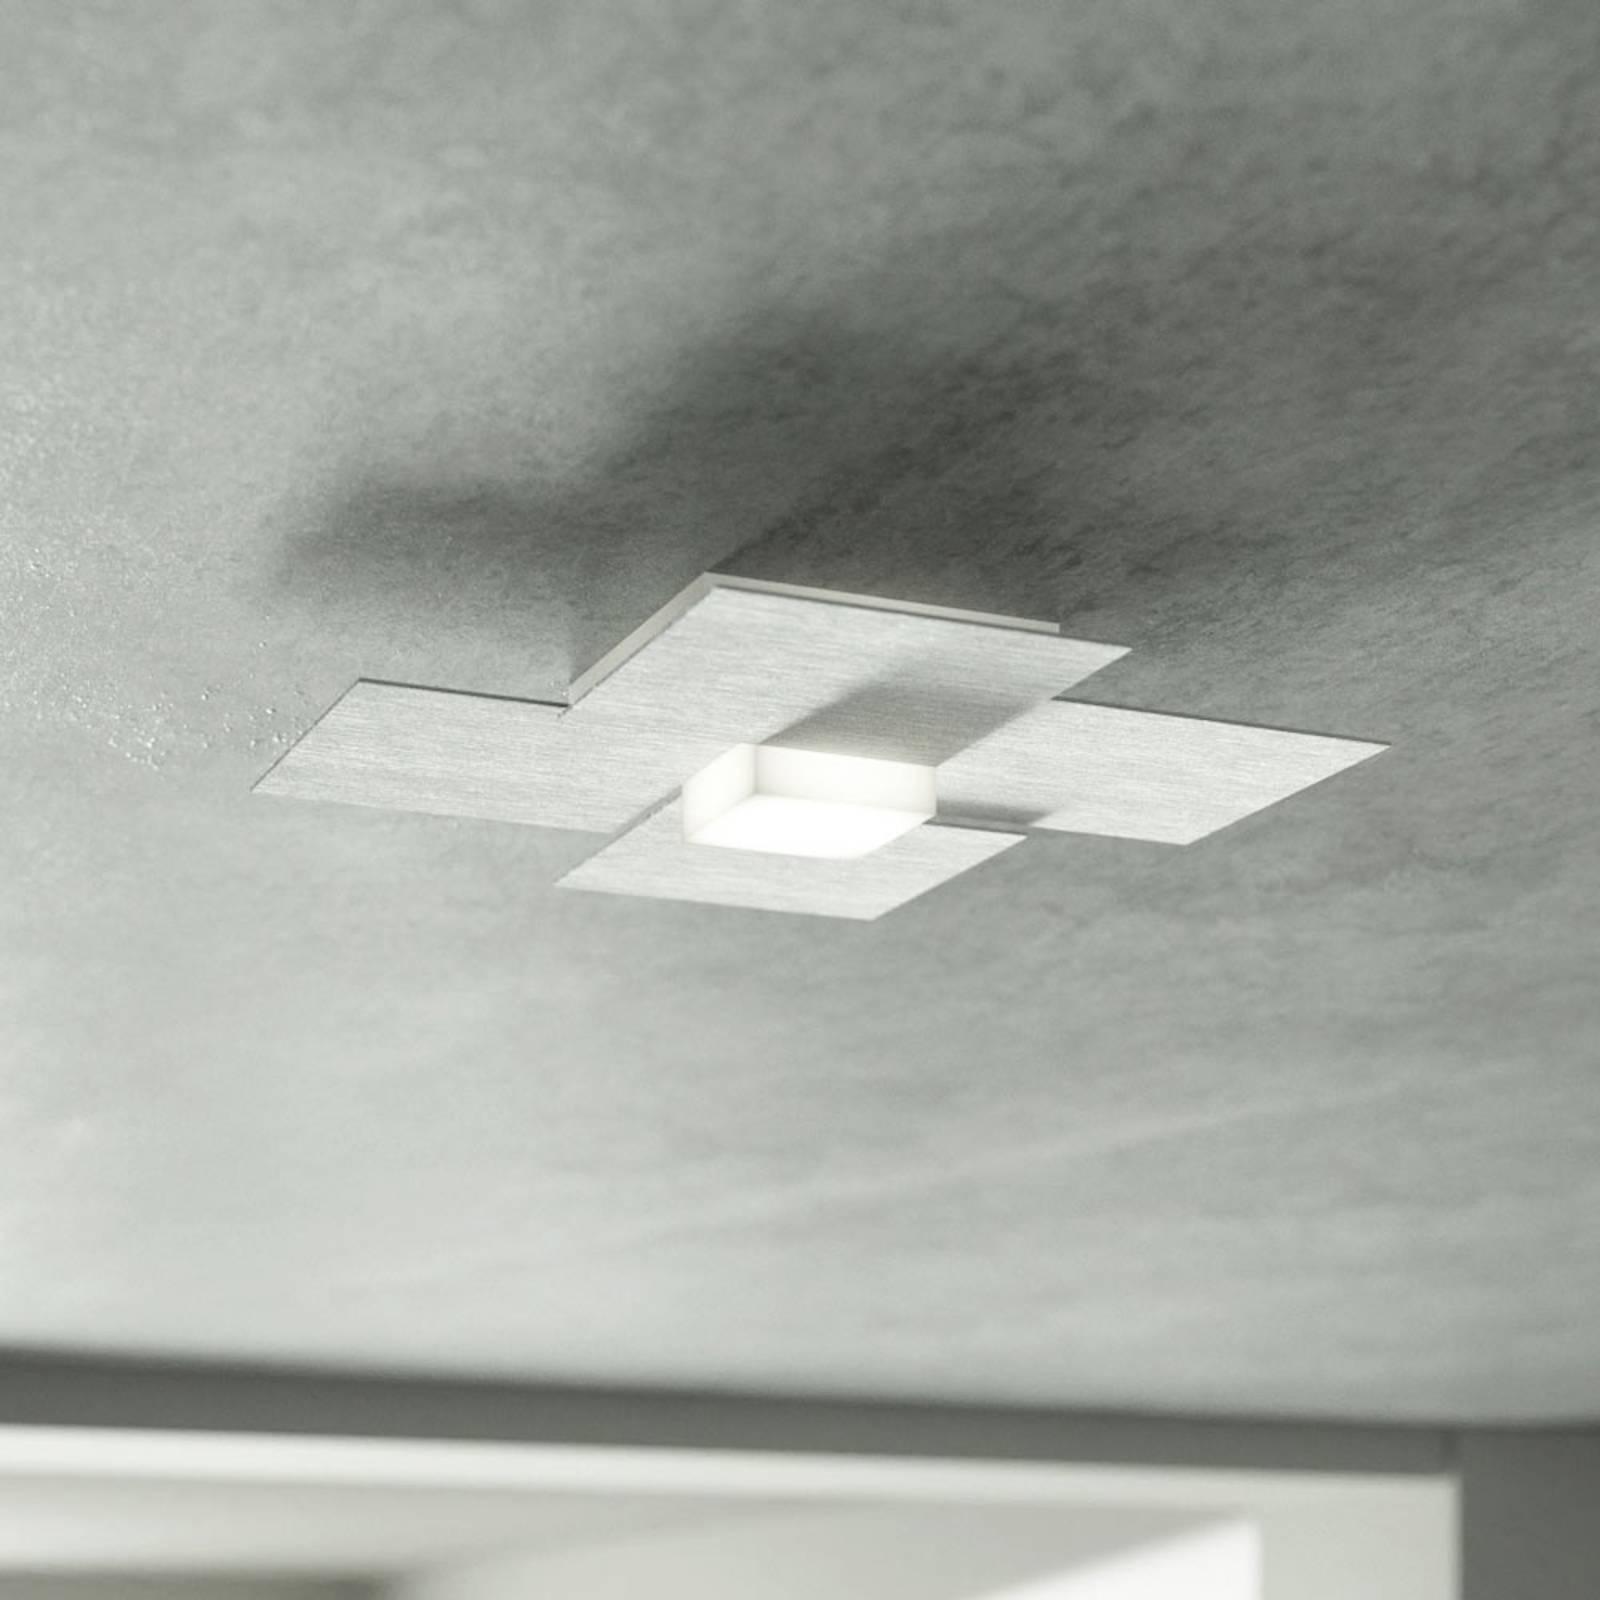 GROSSMANN Creo LED-Deckenleuchte, alu gebürstet